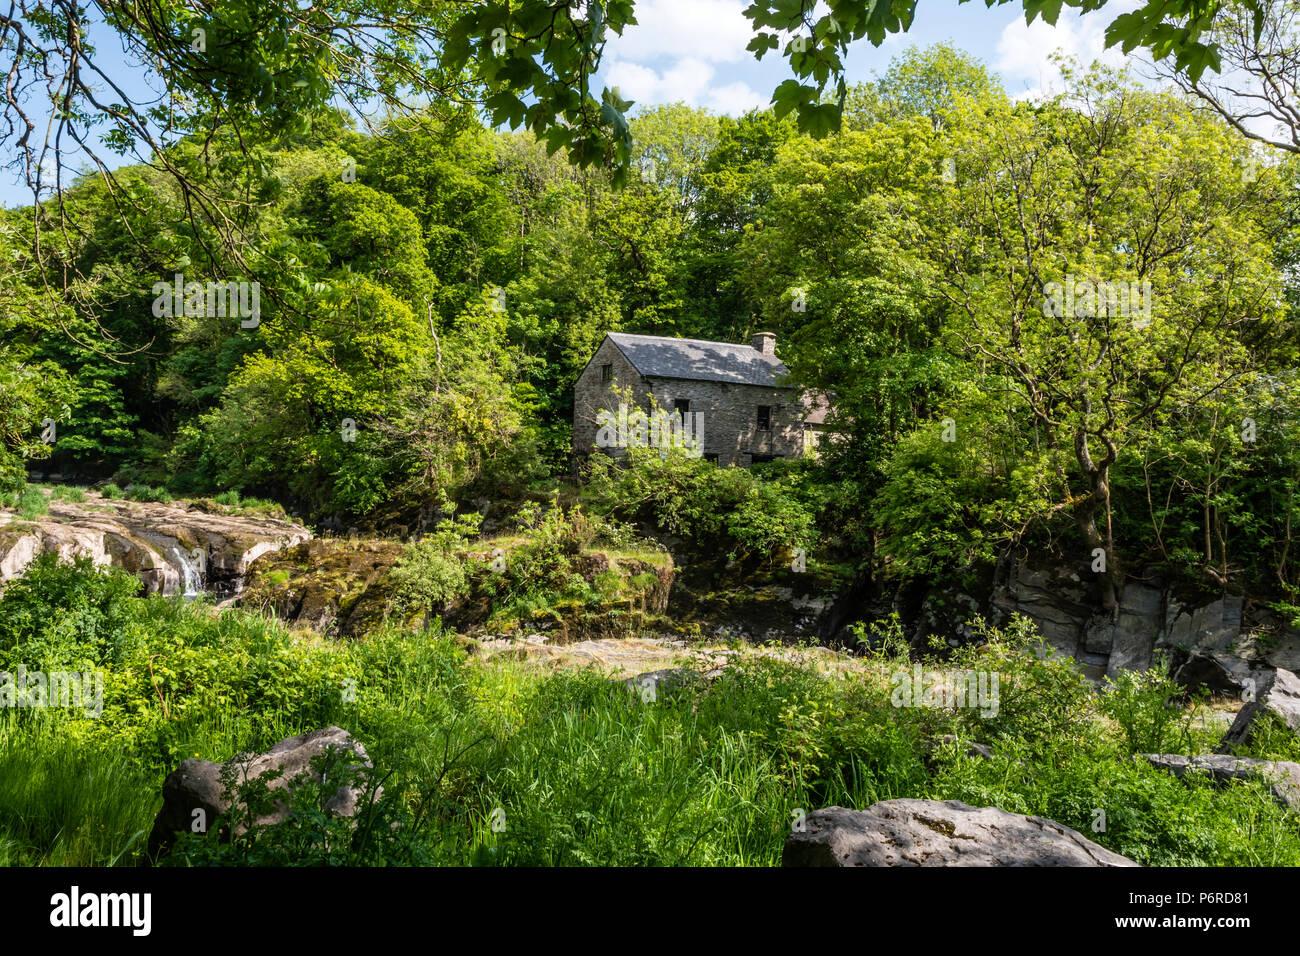 Cenarth Waterfalls & Mill Carmarthenshire Wales Stock Photo